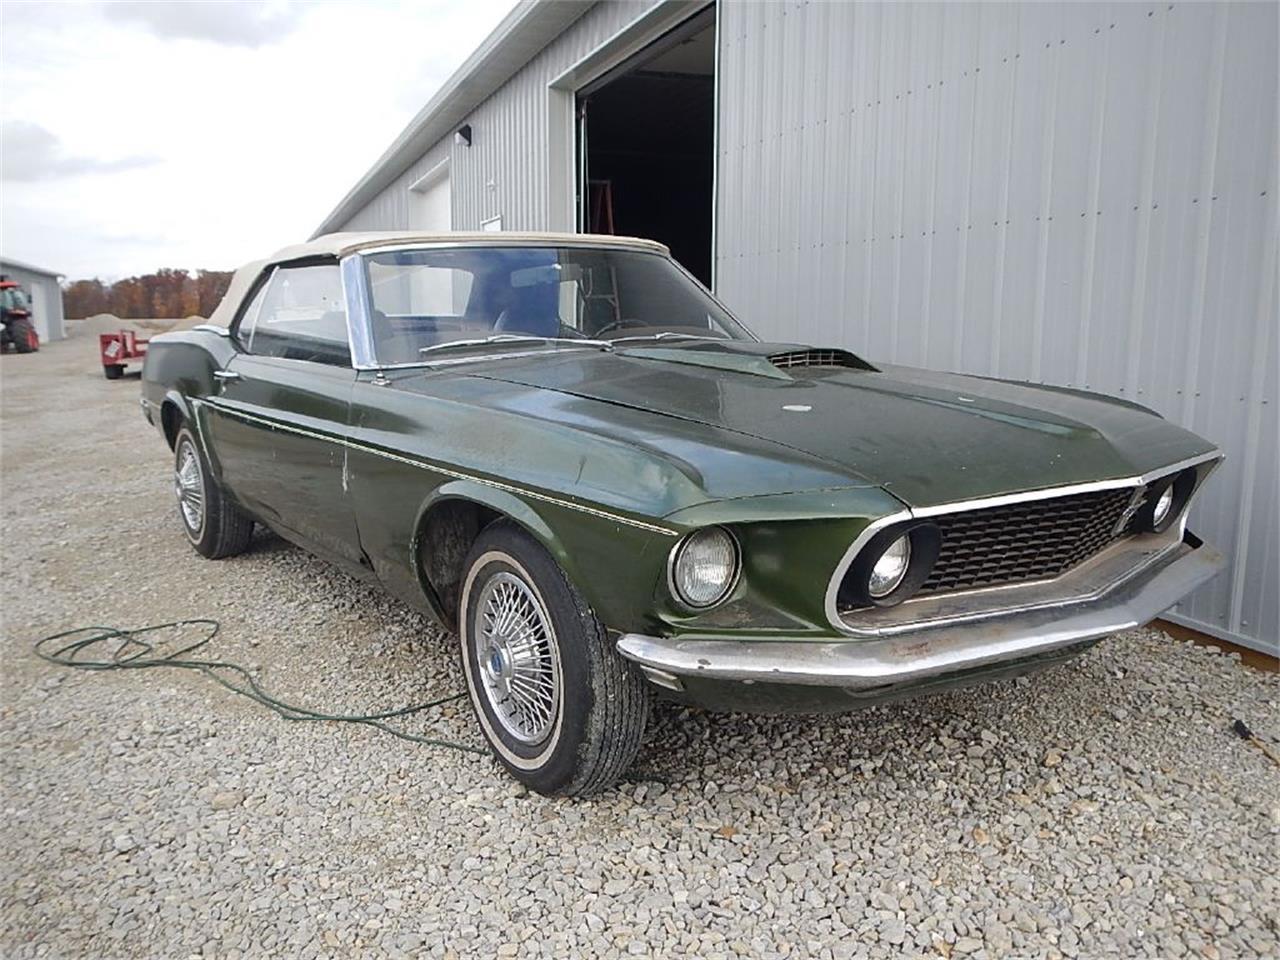 Ford Mustang Cabriolet 1969 prix tout compris 1969